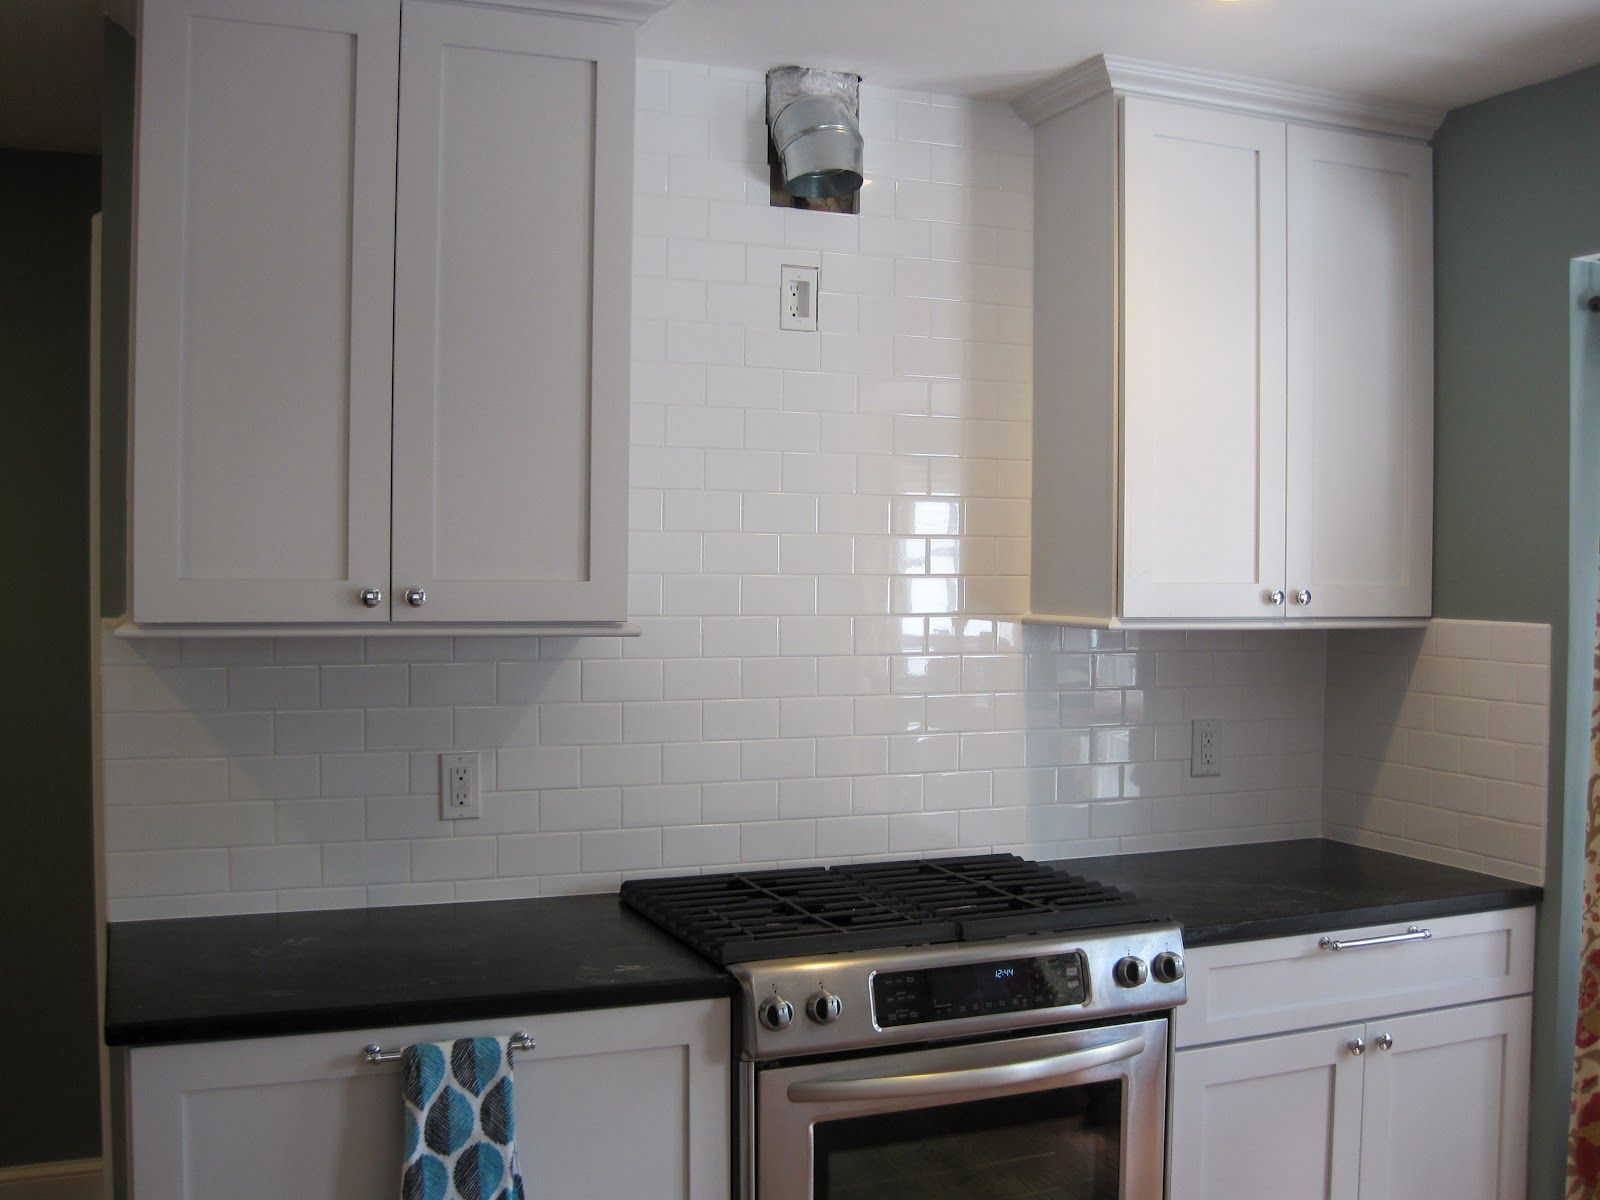 kitchen subway tile backsplash ideas with white cabinets from White ...